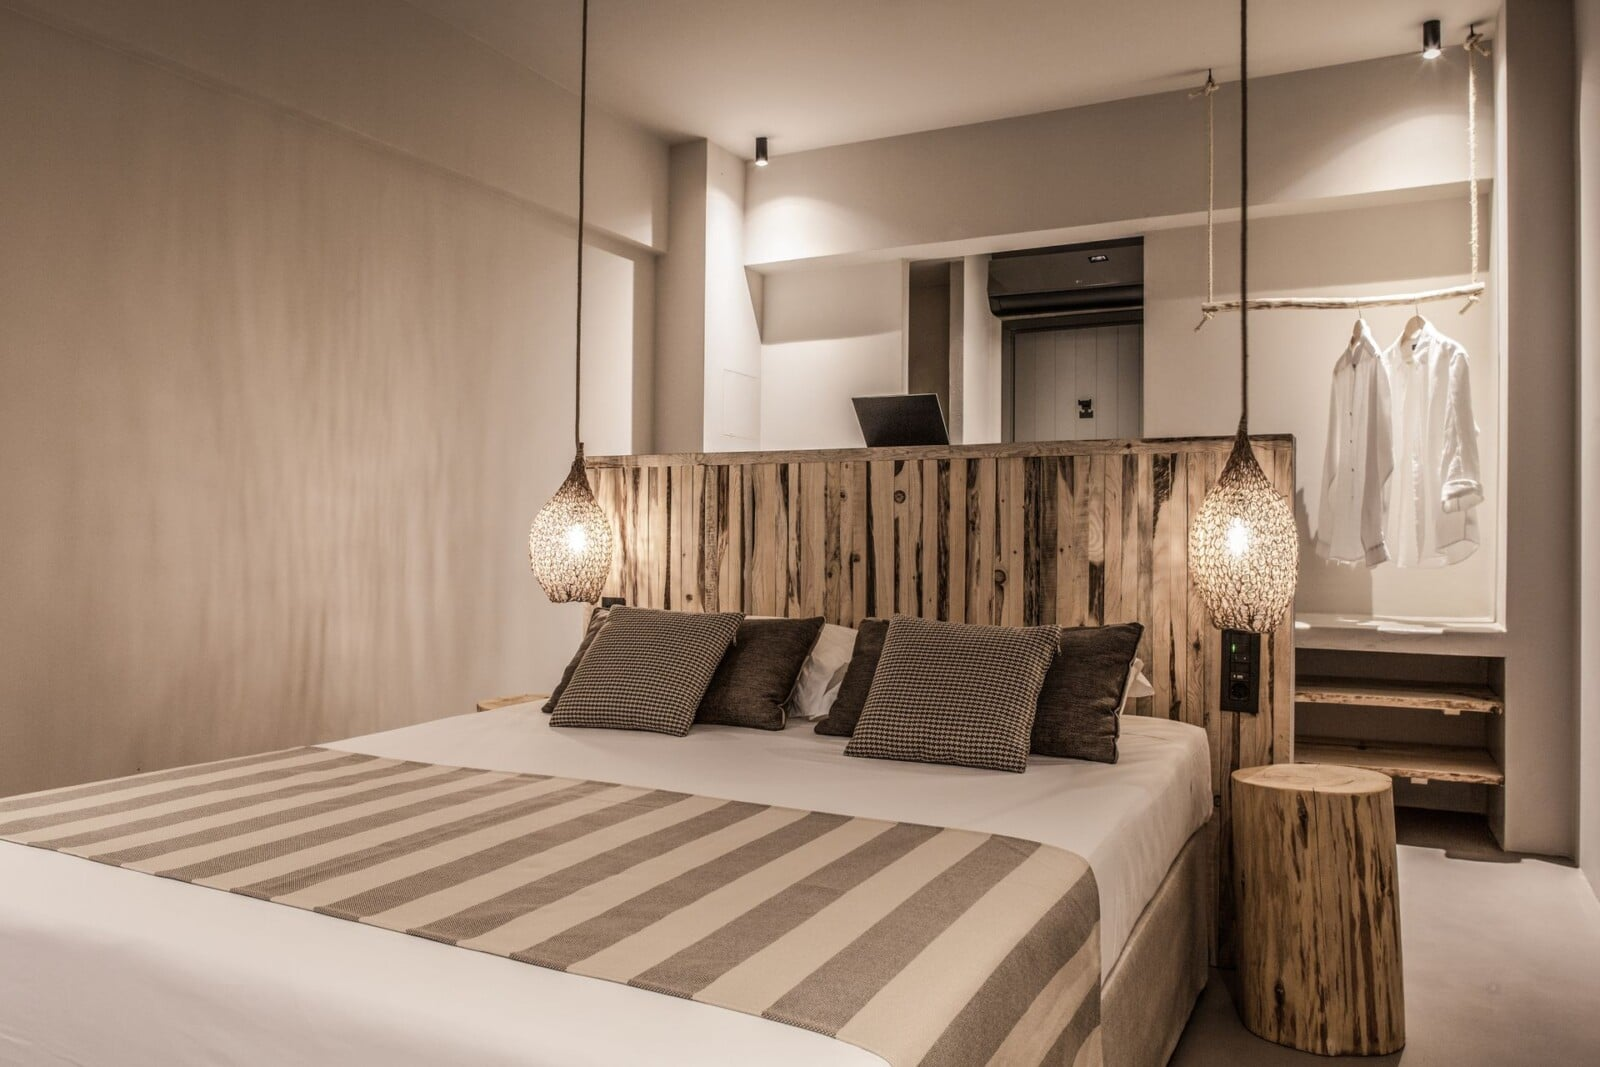 Bedroom of at Doryssa boutique hotel in Samos